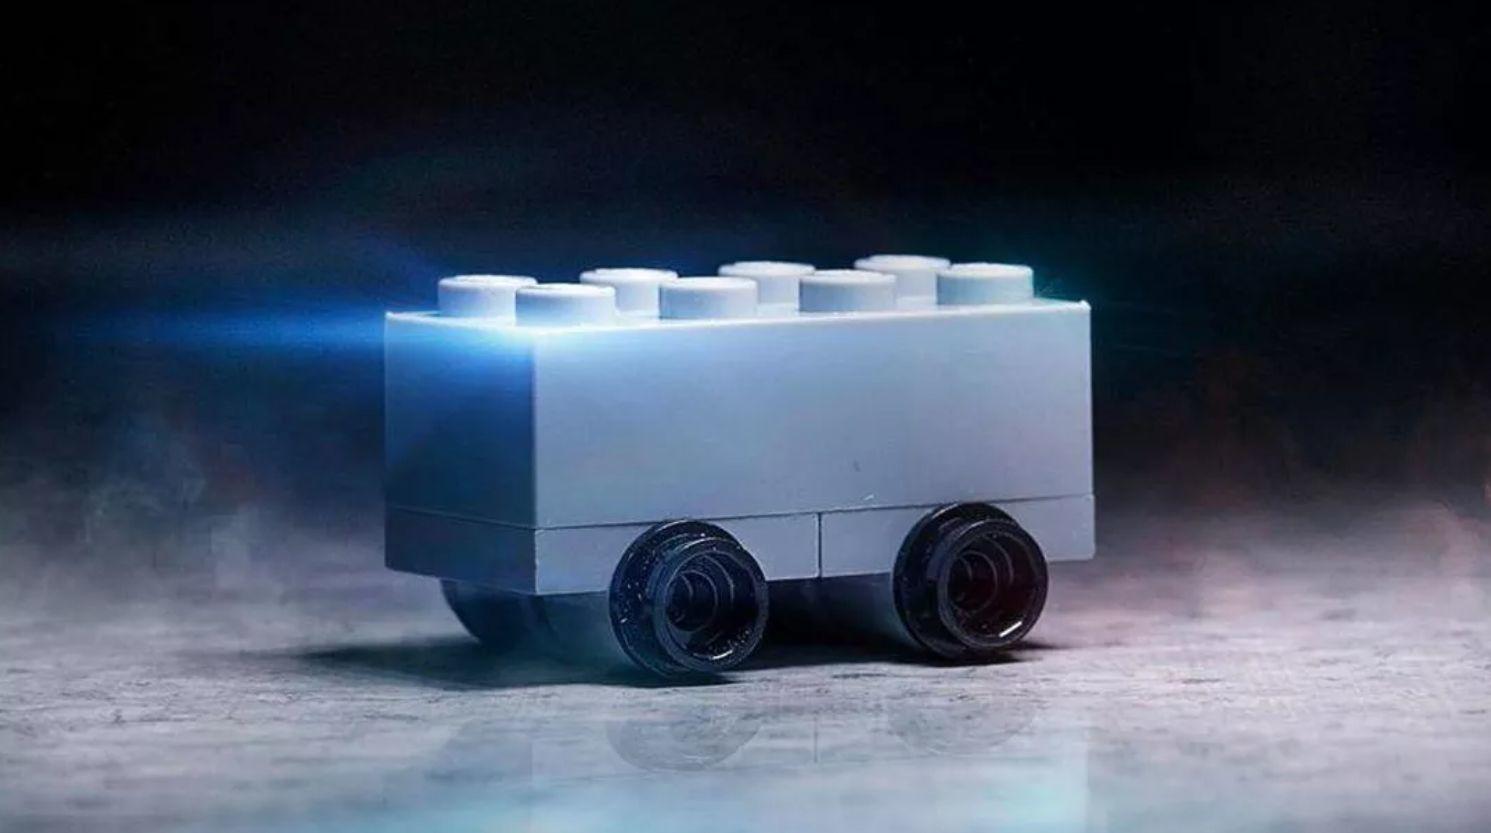 Cybertruck reproduced by LEGO Australia